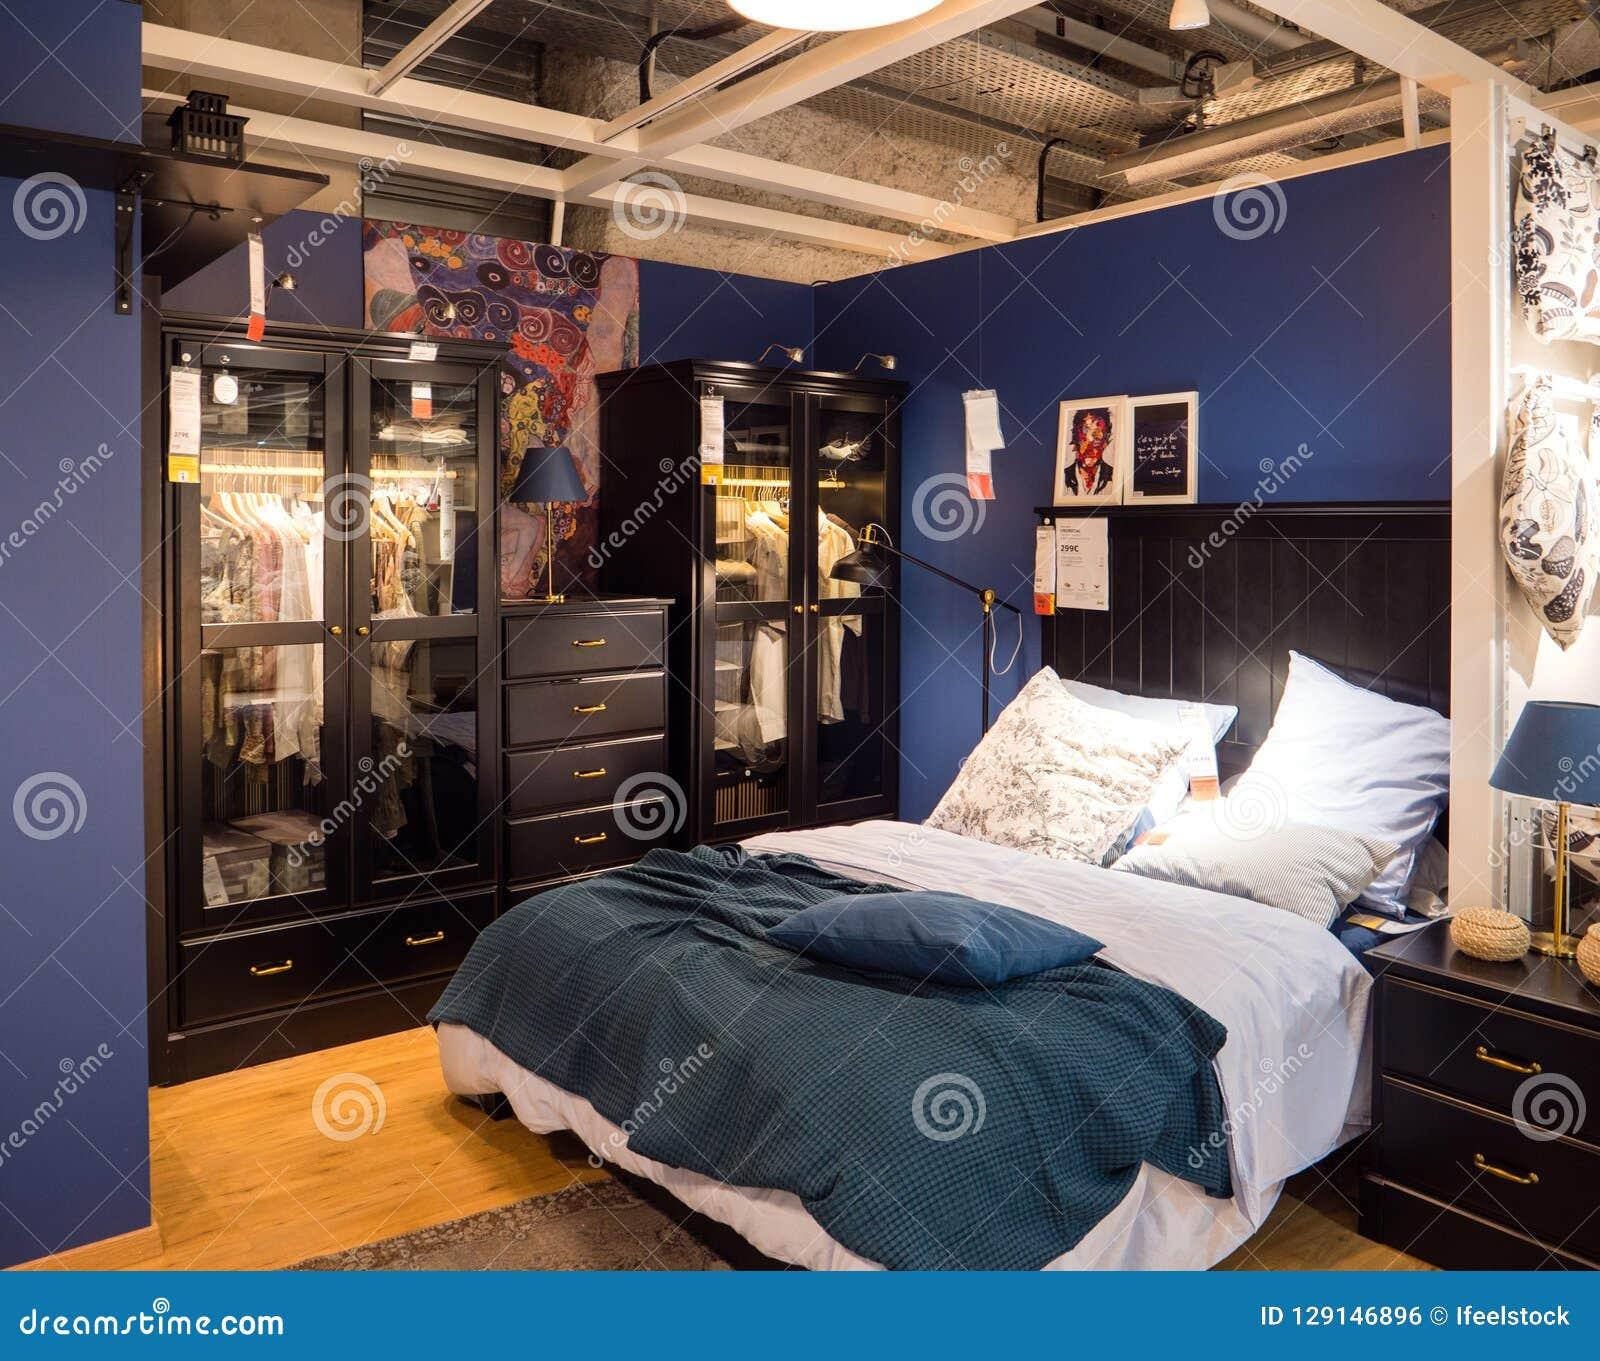 Swedish Bedroom Ikea Store Editorial Photo Image Of Hotel 129146896